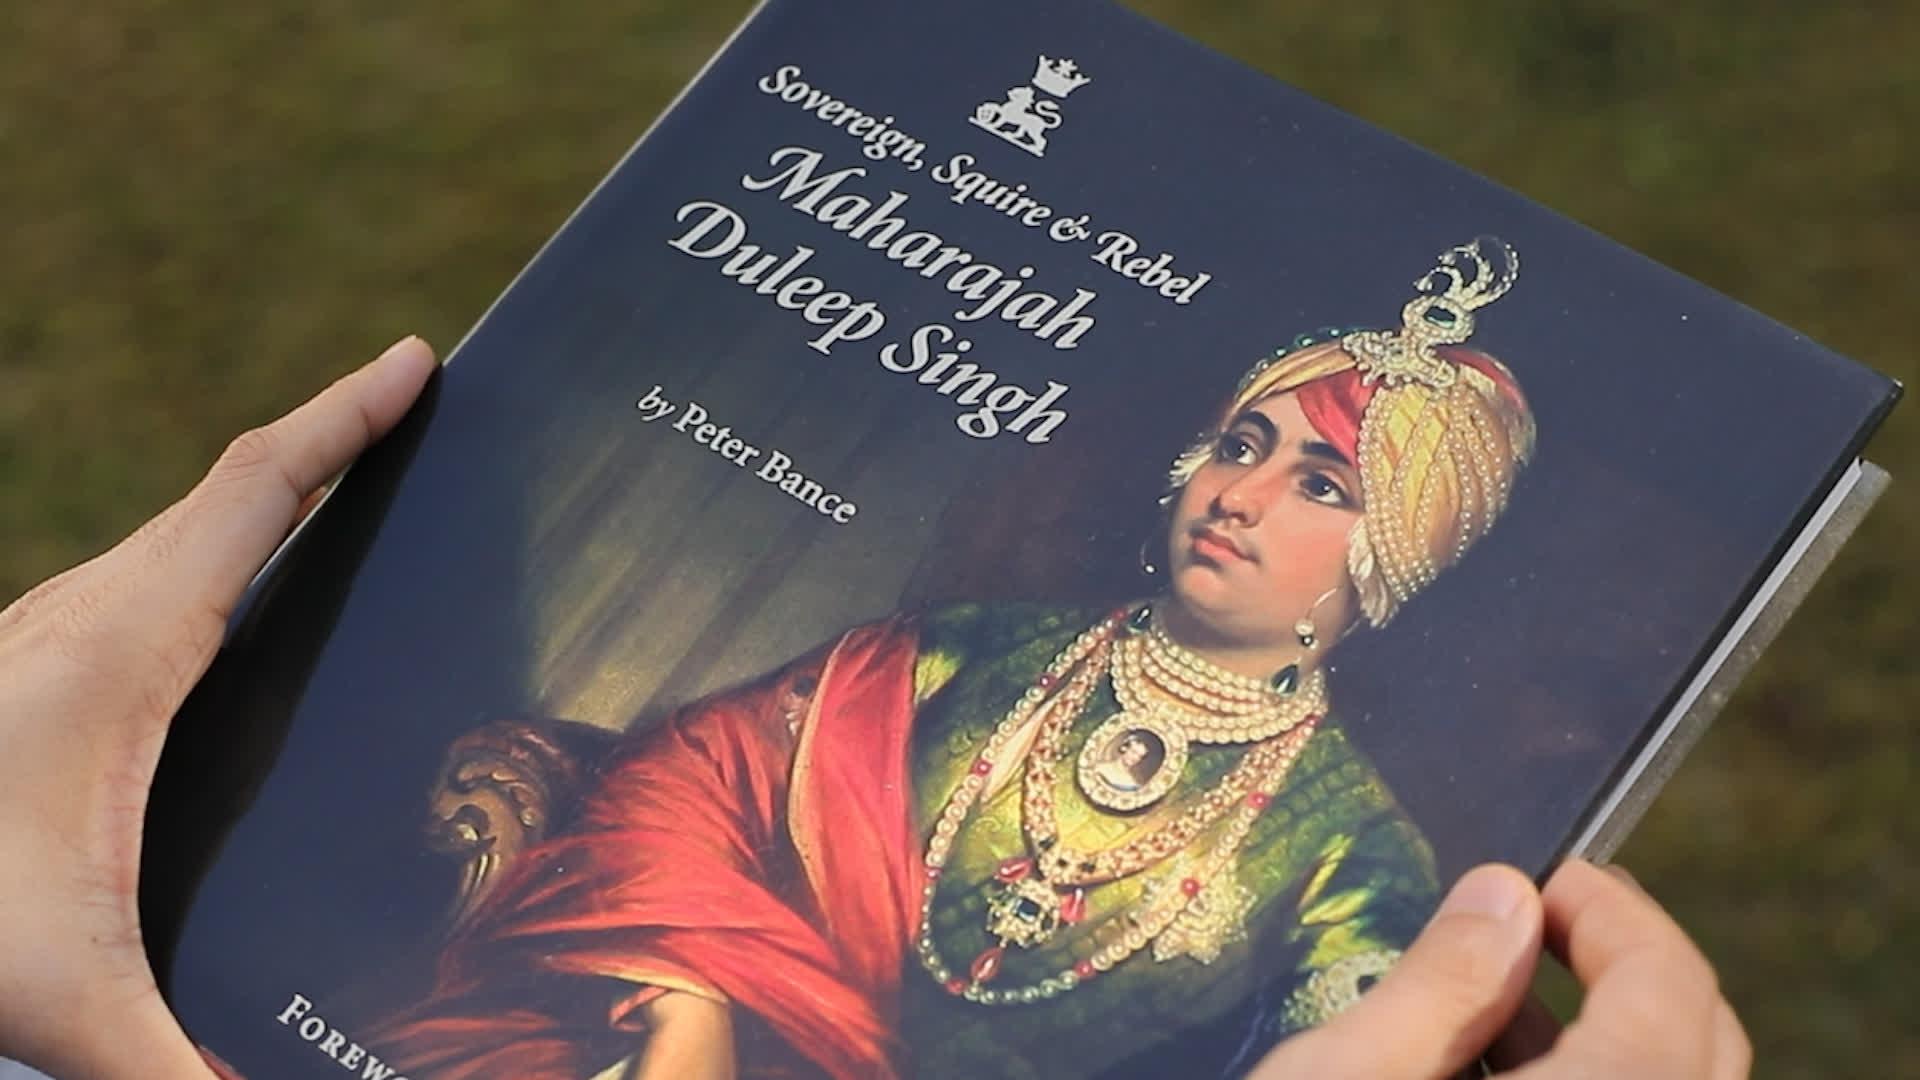 Duleep Singh – The Tragic Prince